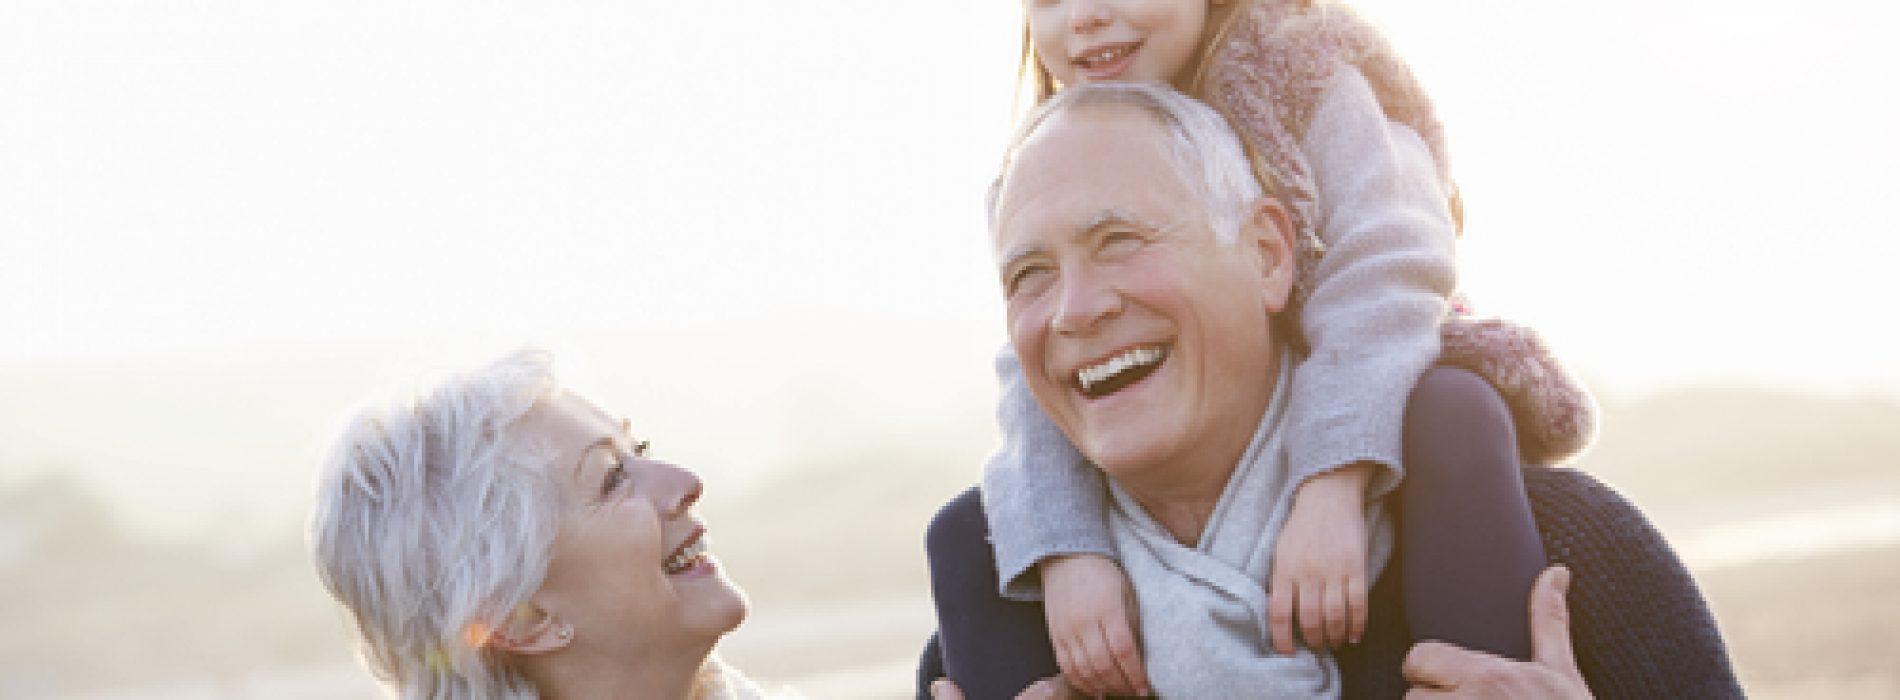 Grandparents: Smart Ways To Help Your Grandchildren Cope With Their Parents' Divorce!